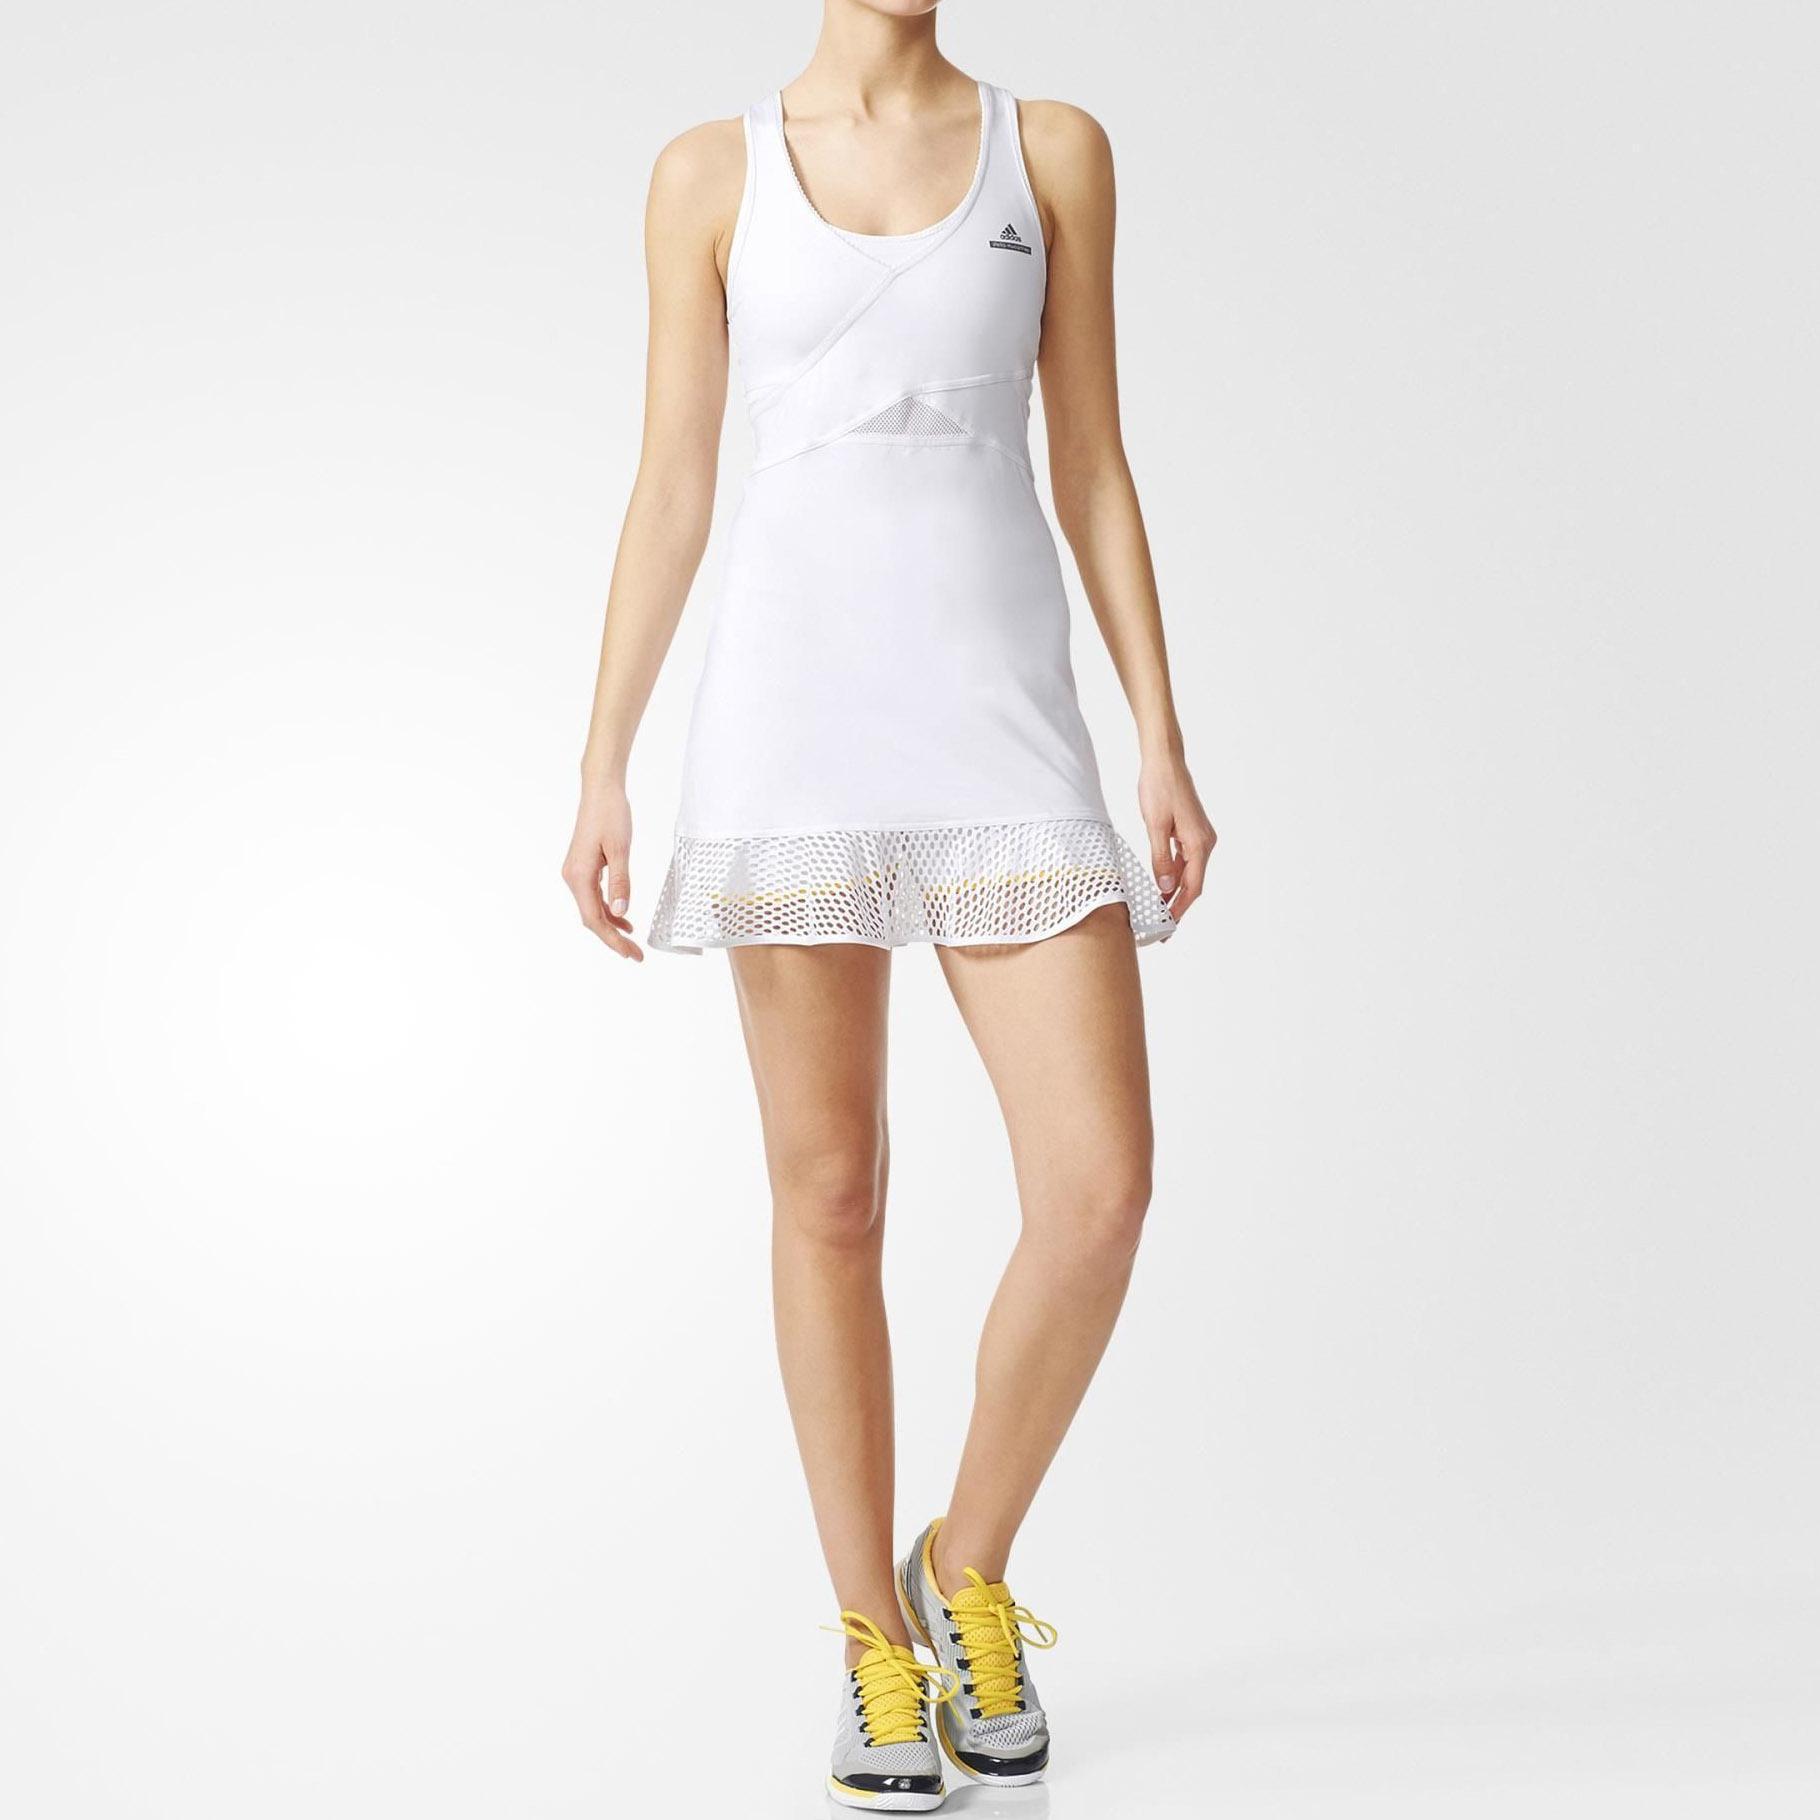 eb9840fe15b55 Adidas Womens Stella McCartney Barricade Dress - White - Tennisnuts.com